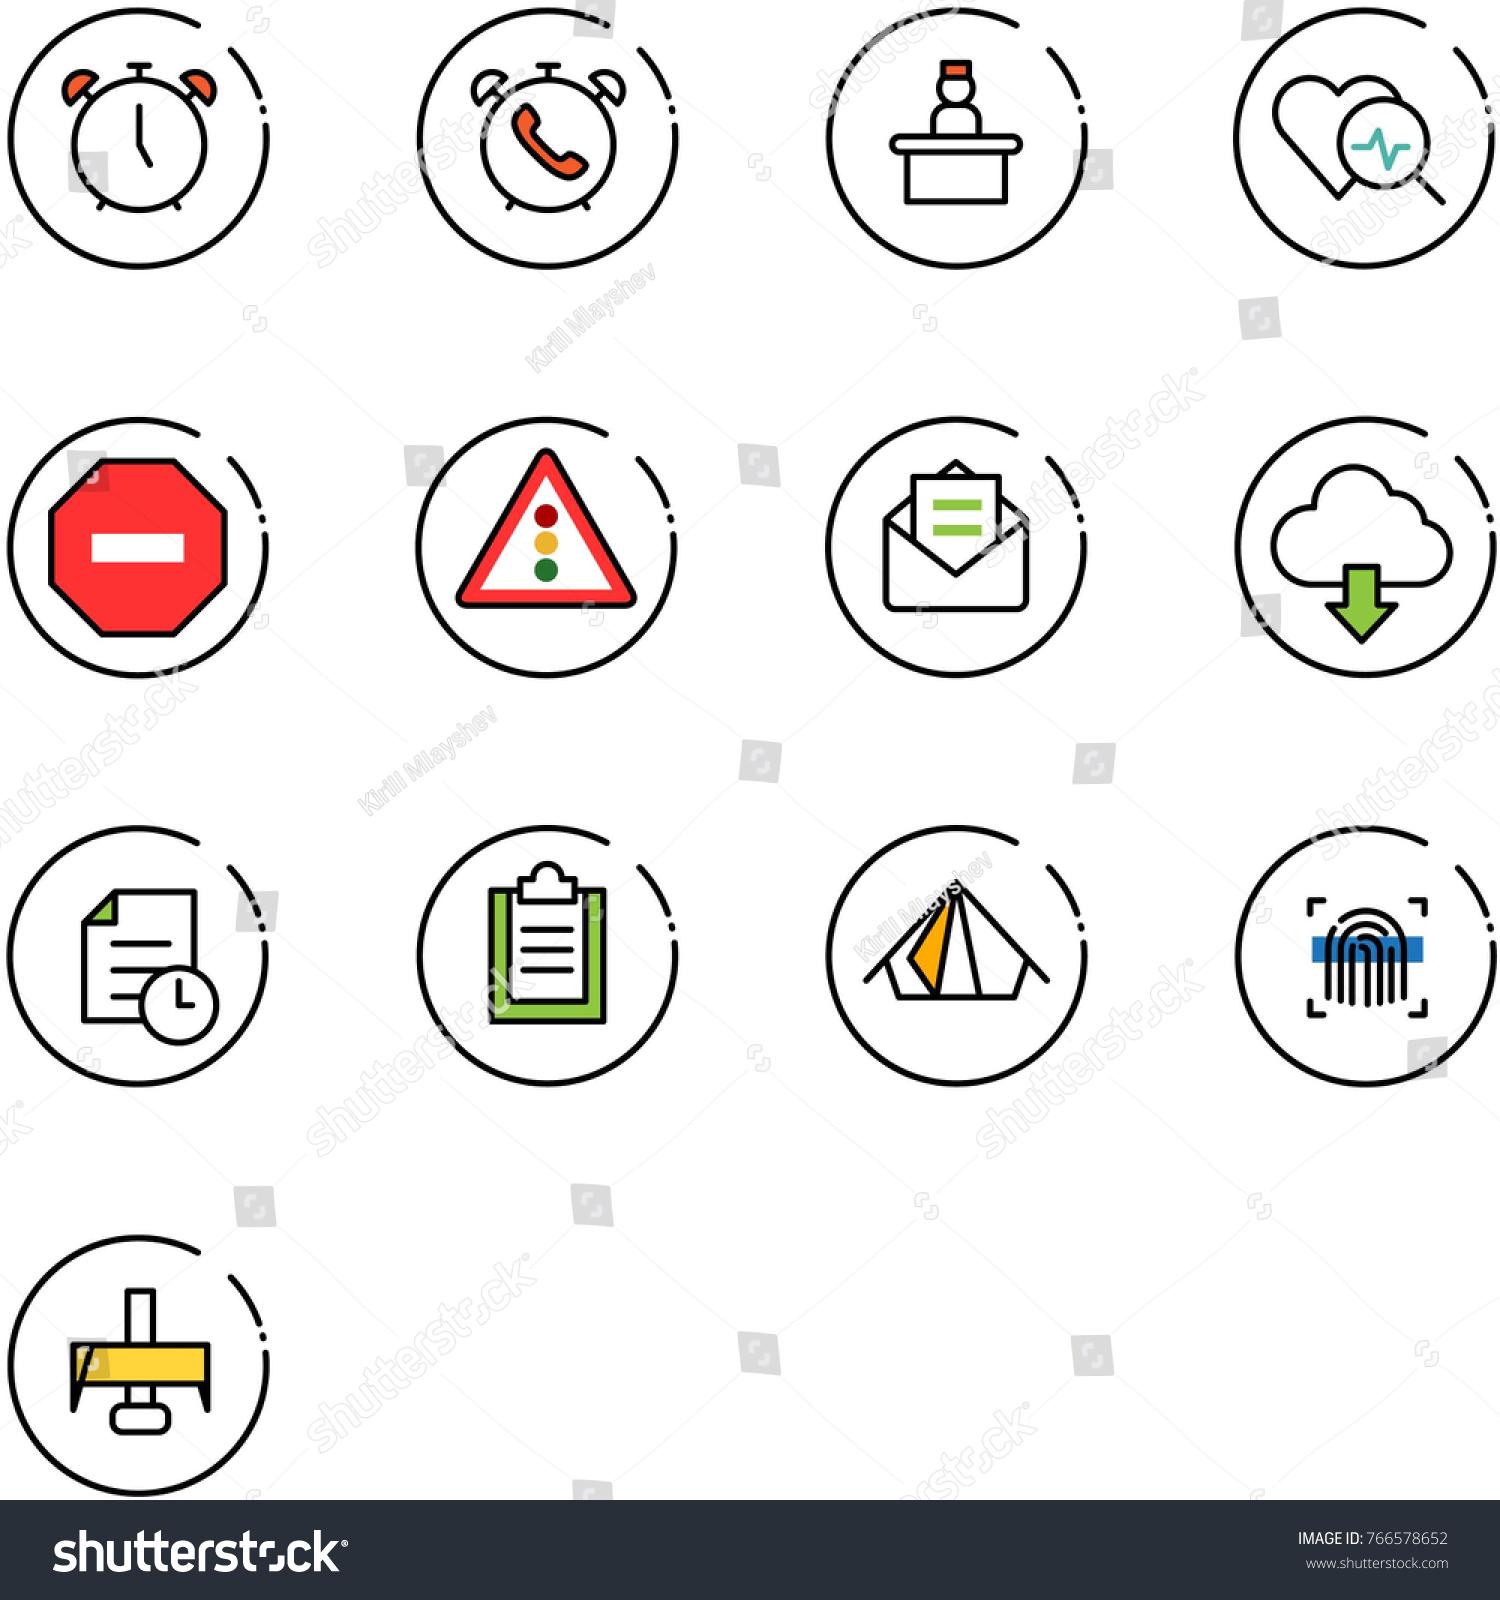 Cguard Isn T Light On Csite Security  sc 1 st  Best Tent 2018 & Tent Alarm - Best Tent 2018